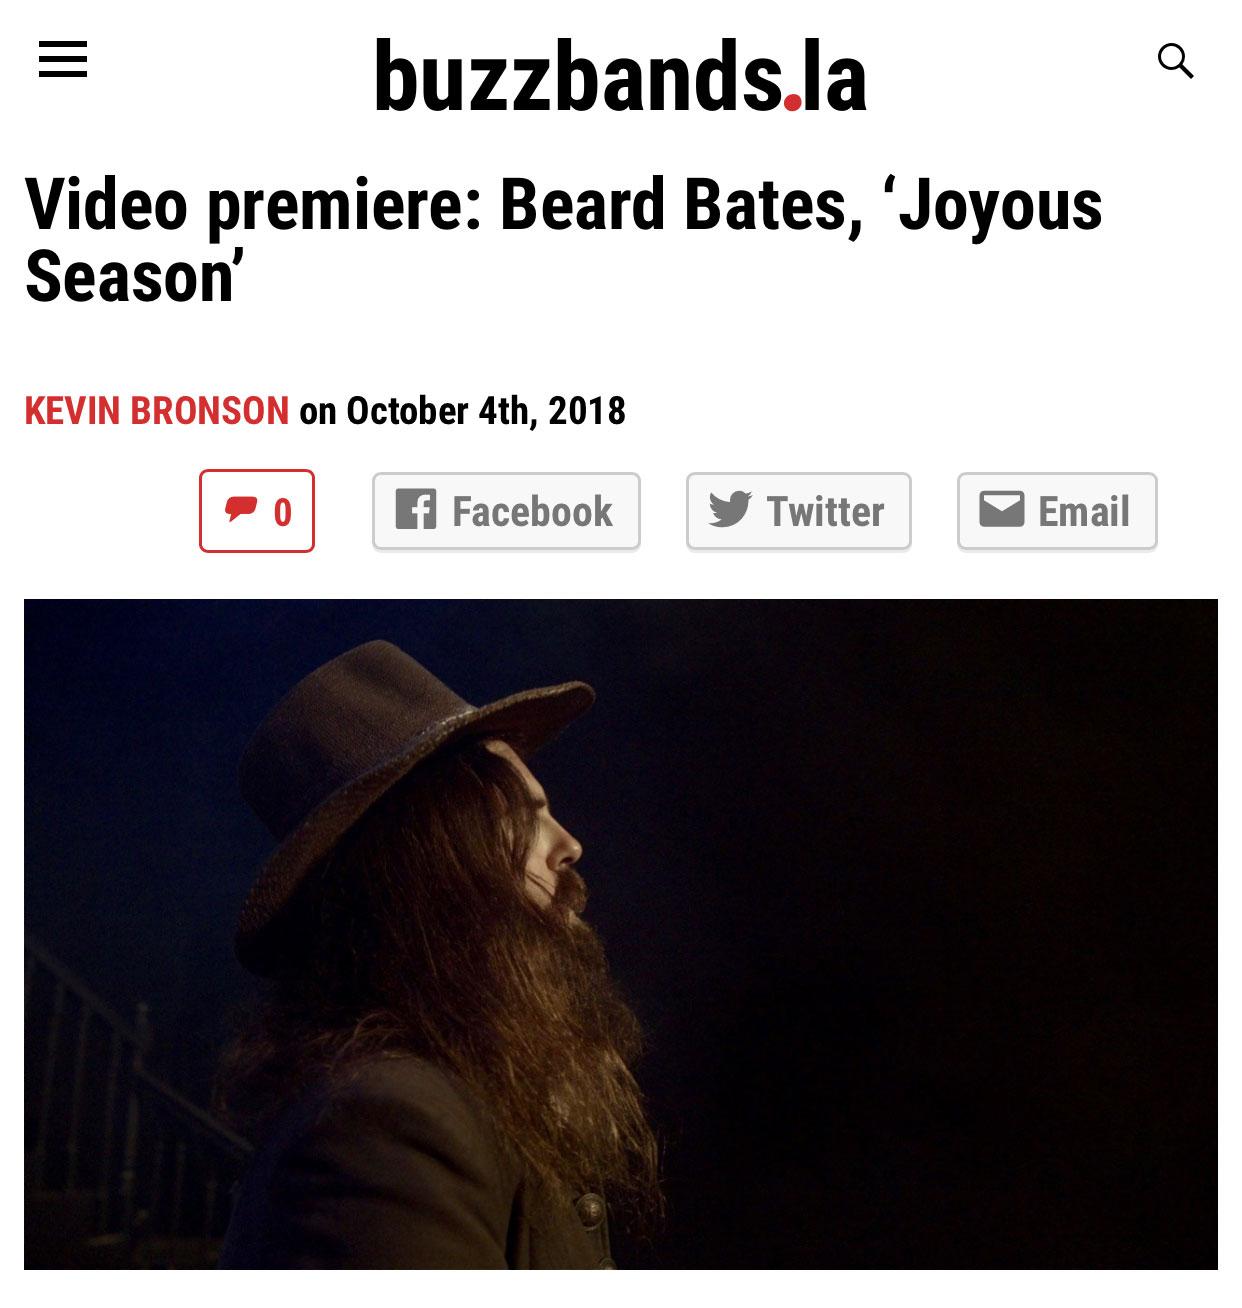 Beard Bates - Buzzbands LA - Joyous Season video premiere